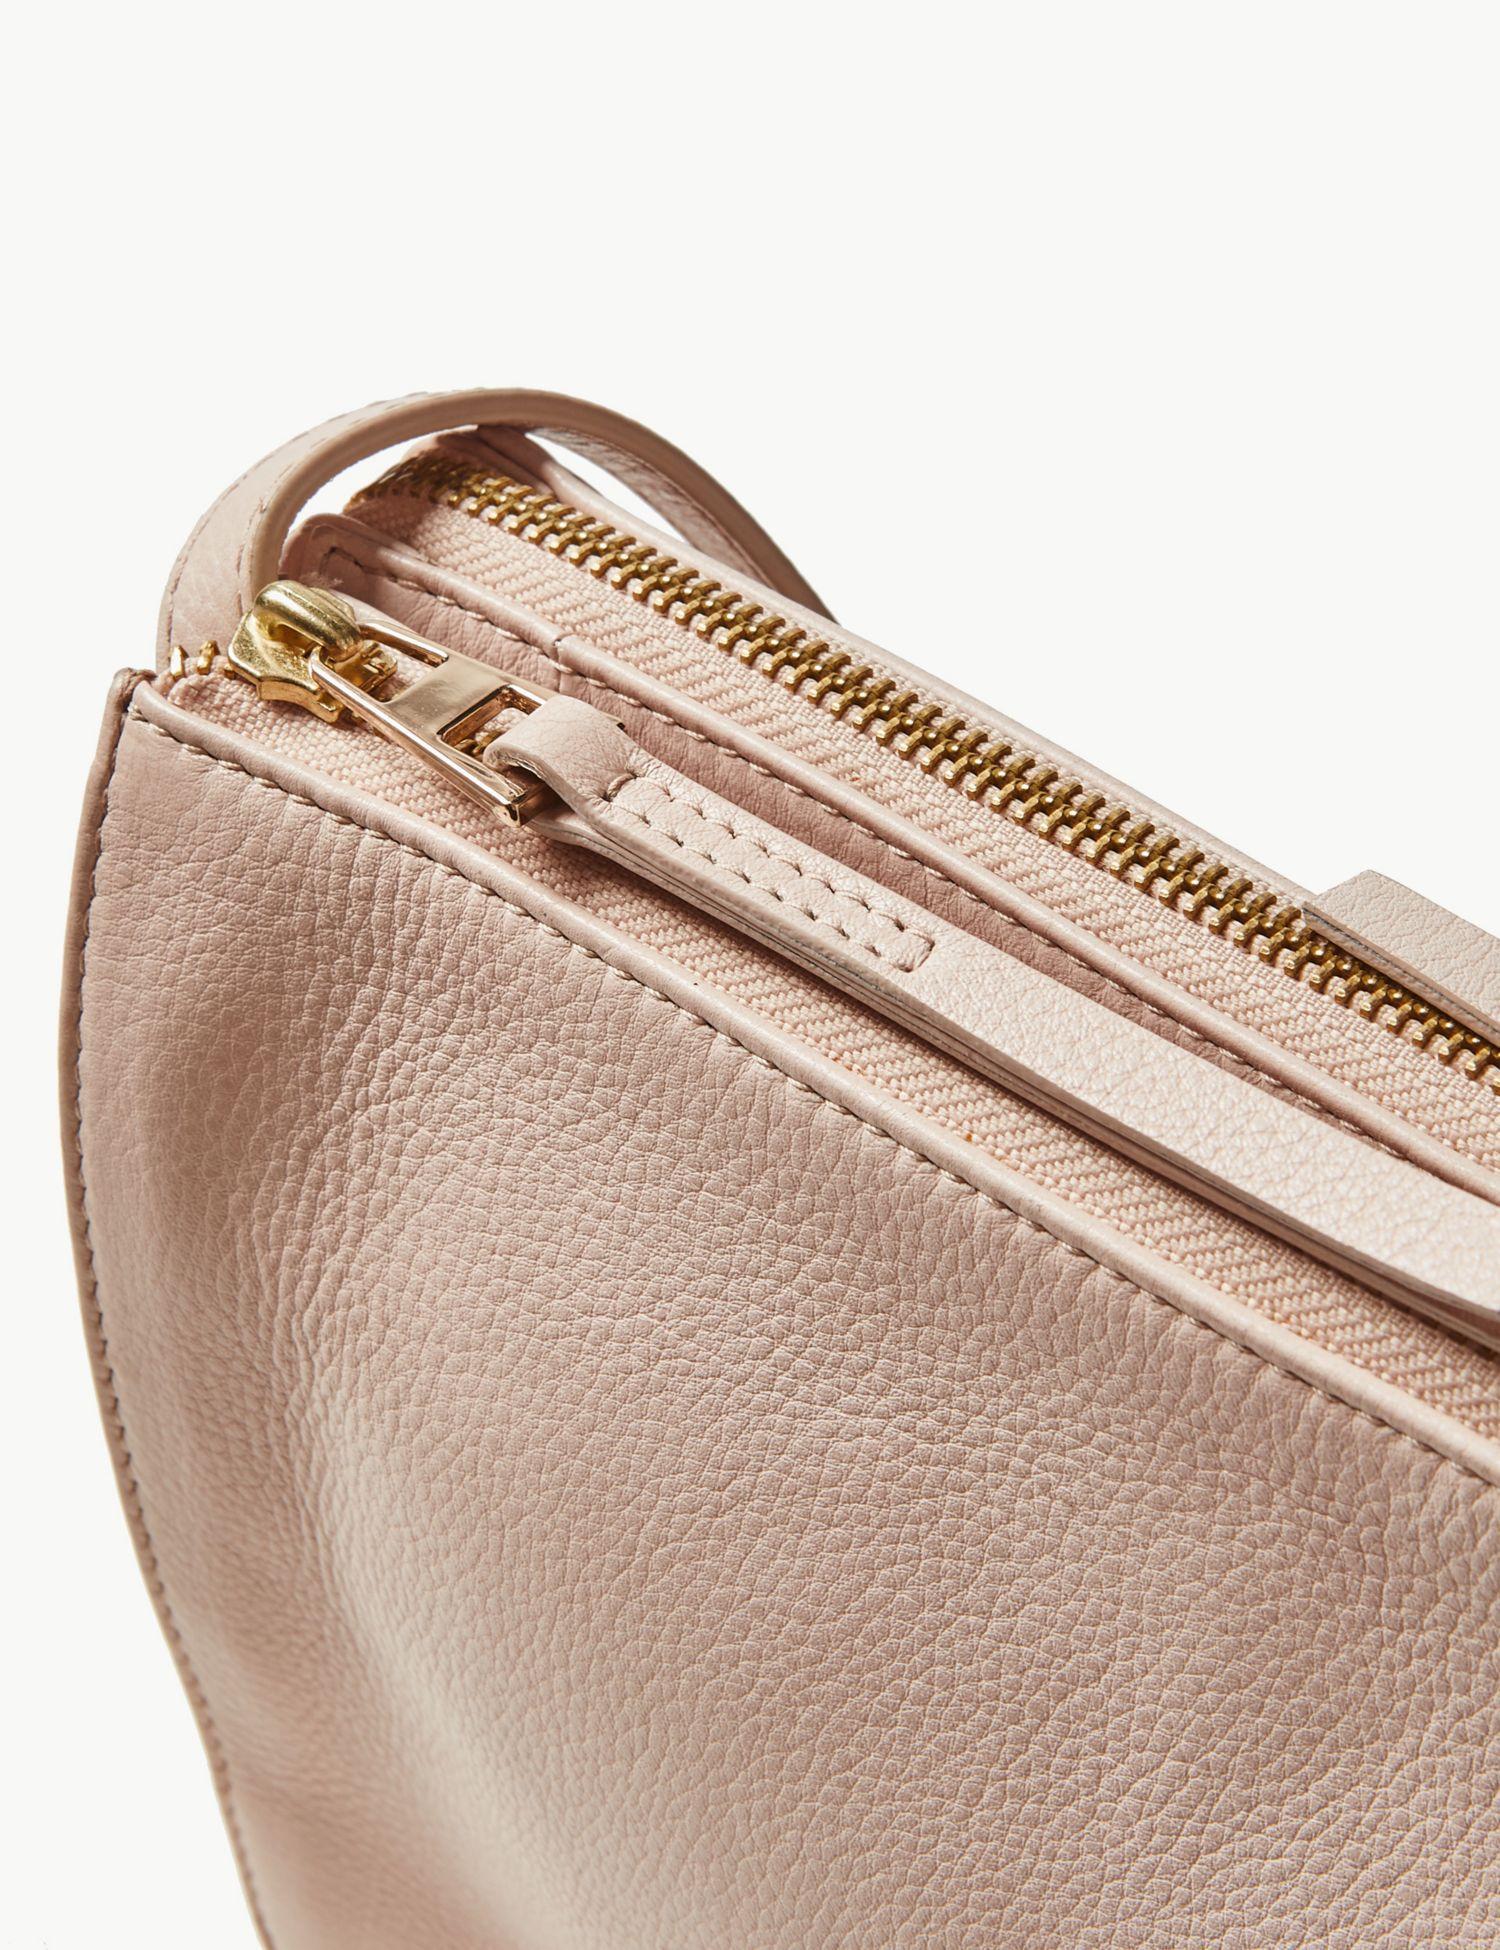 88c31d9fe64 Marks   Spencer - Natural 2 Part Leather Cross Body Bag - Lyst. View  fullscreen